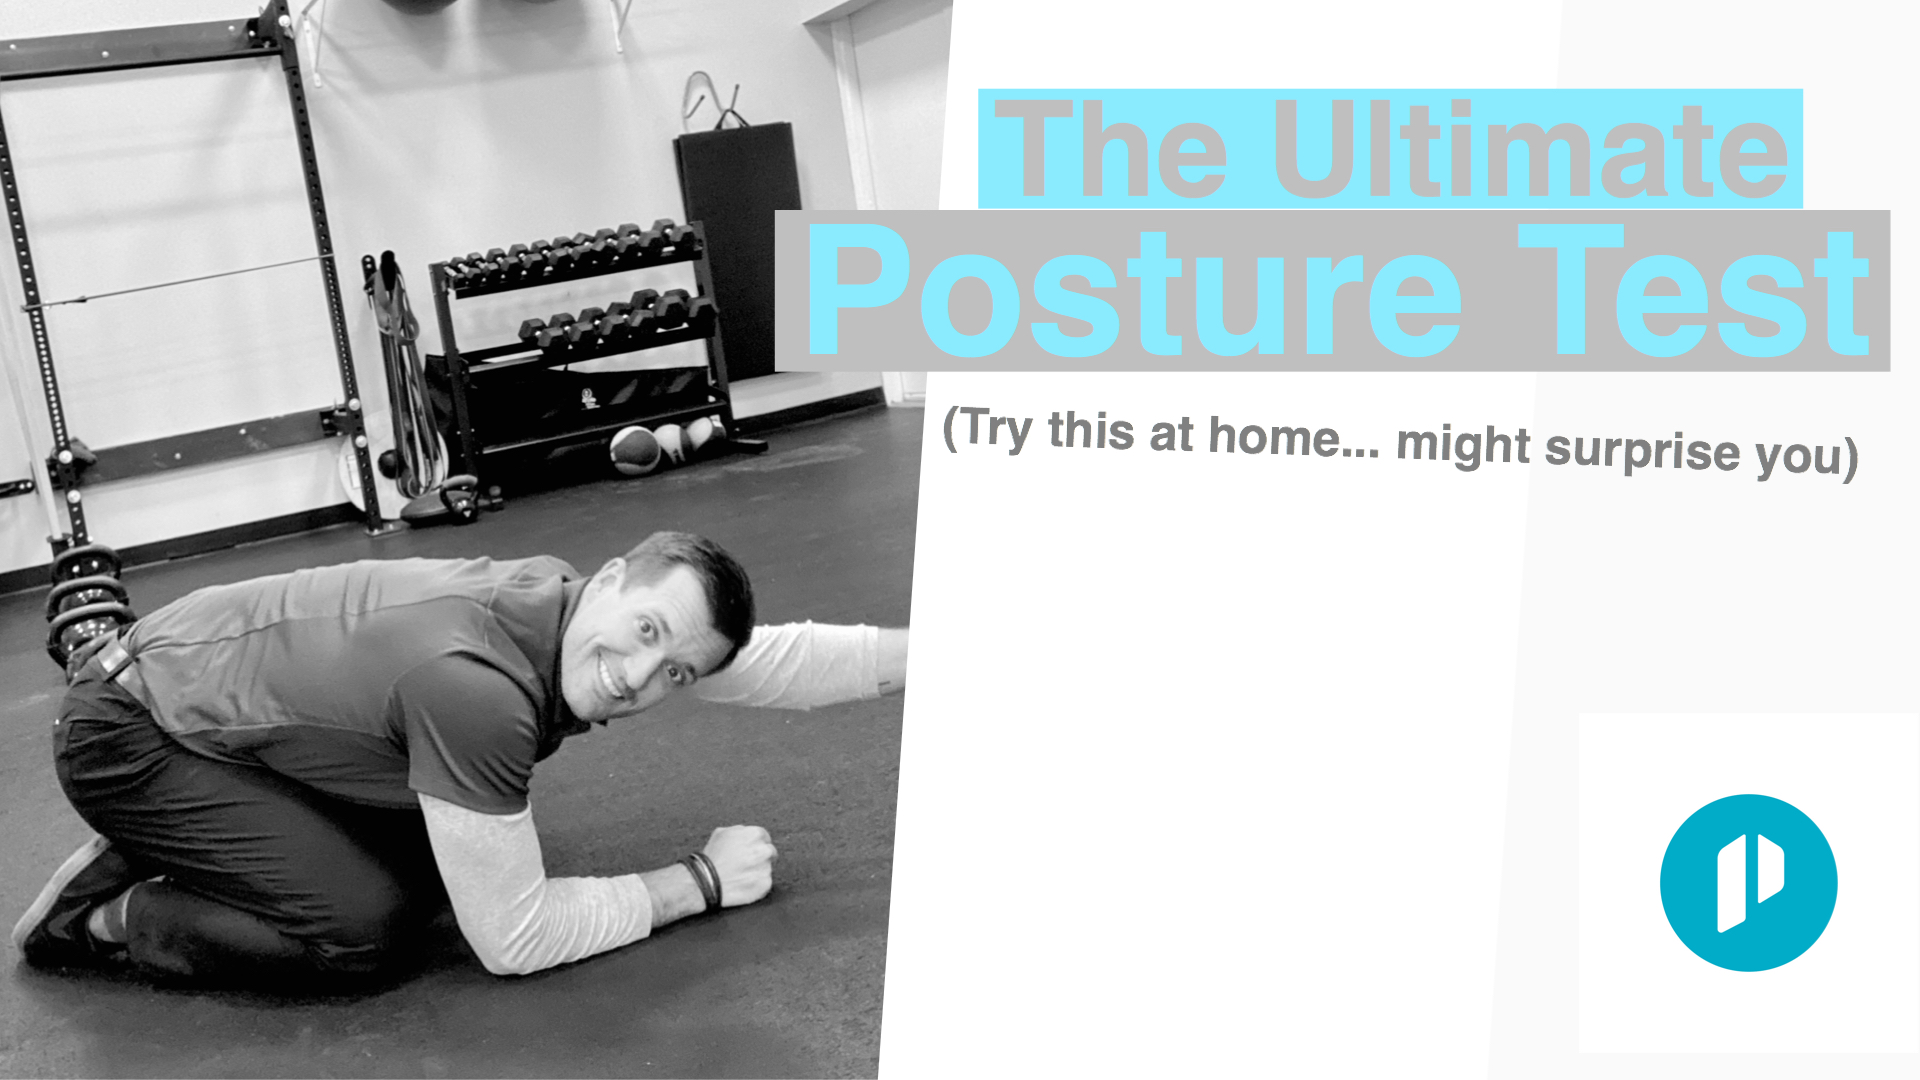 Ultimate posture